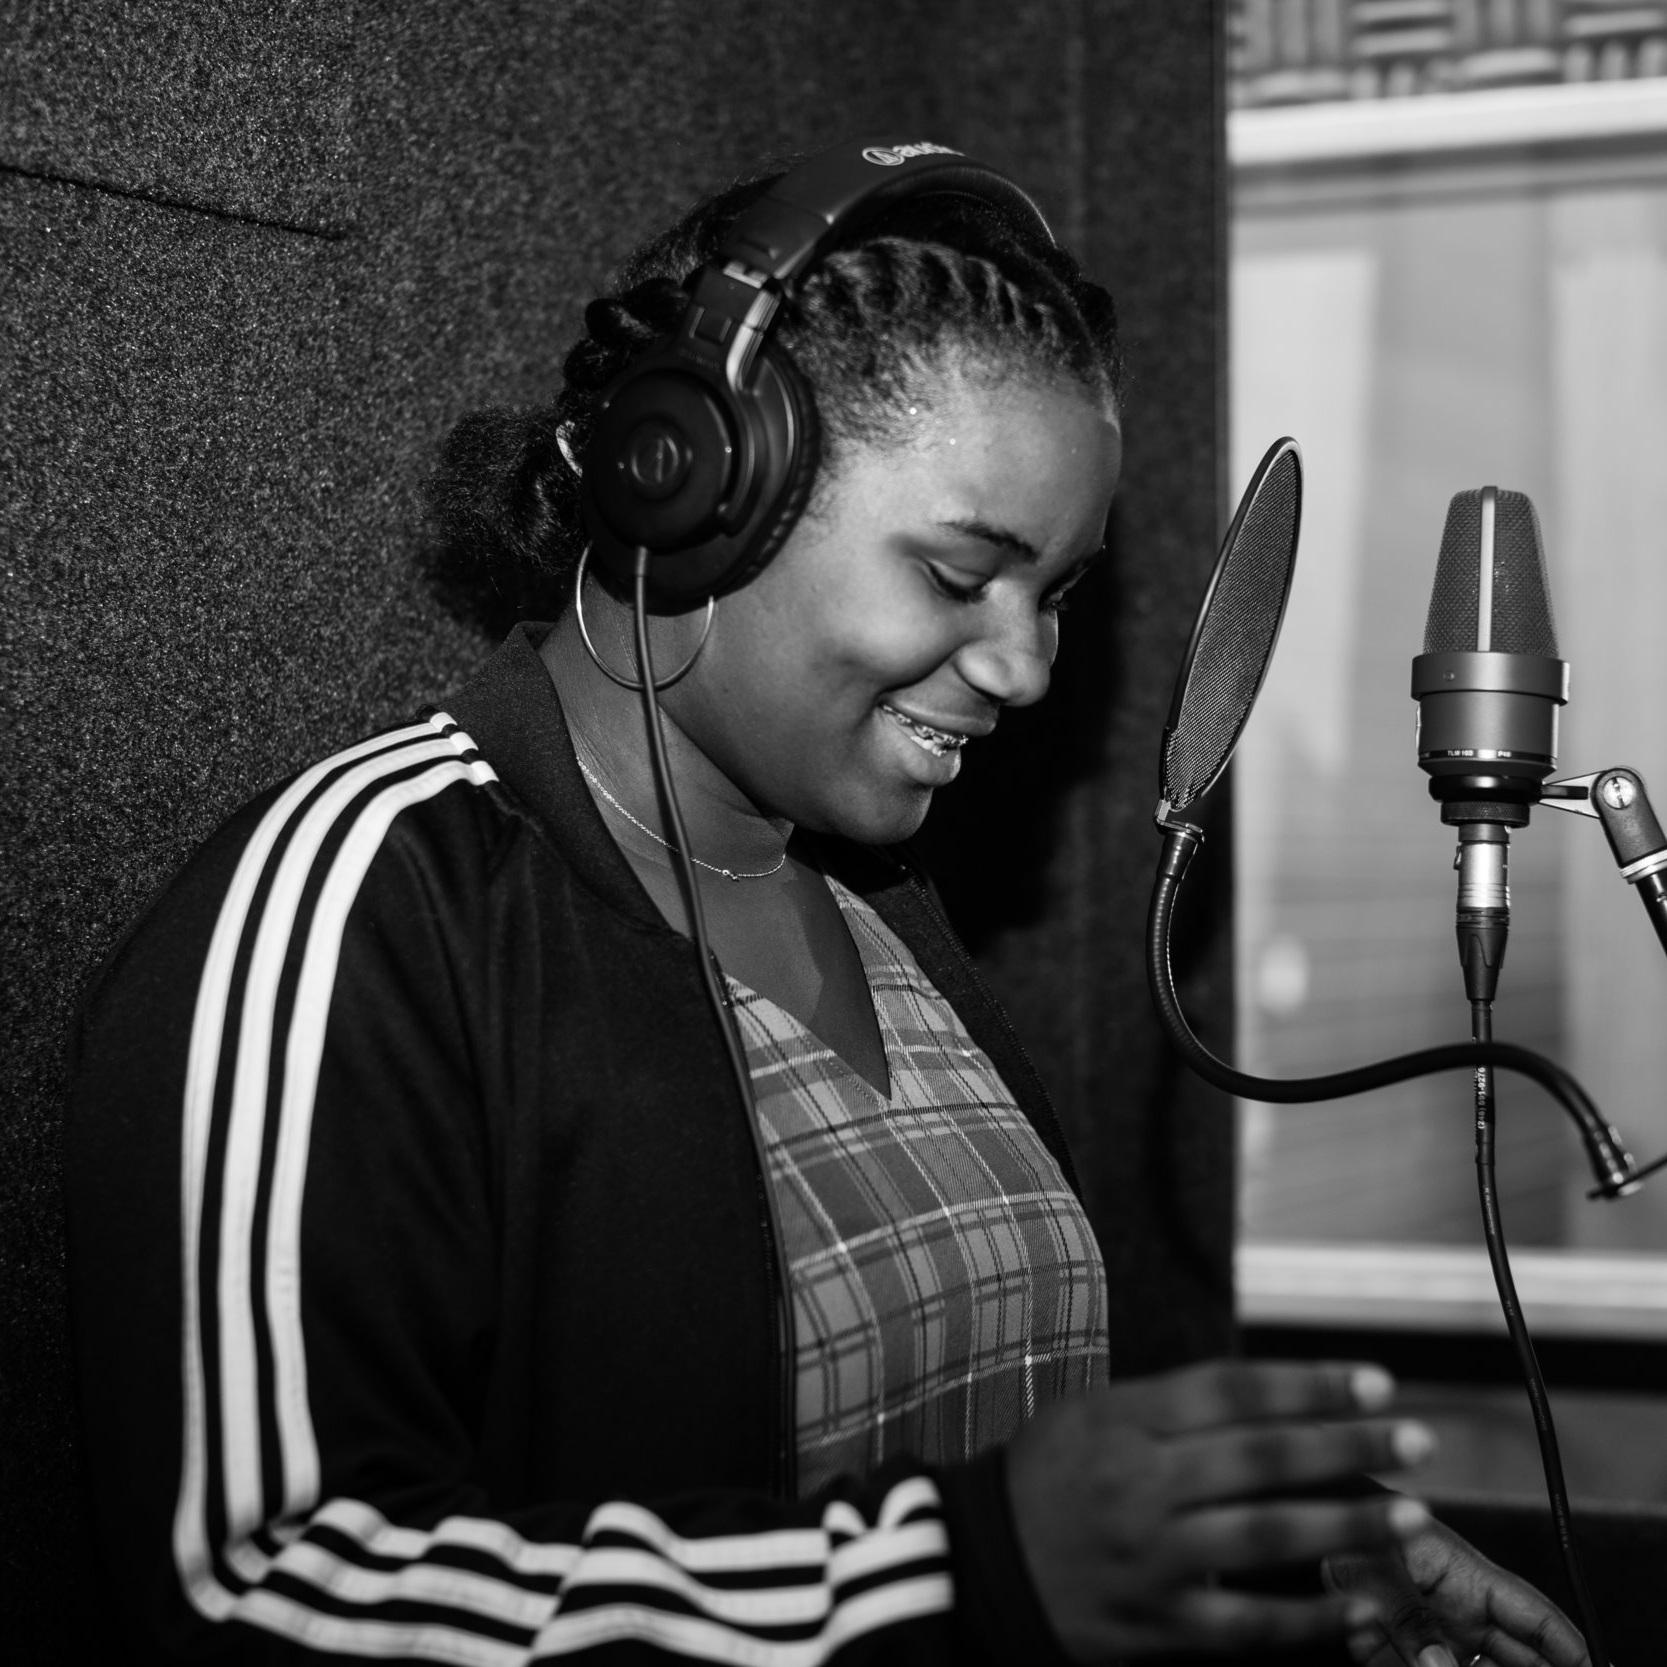 Calah McGraw - SingerAbout calah